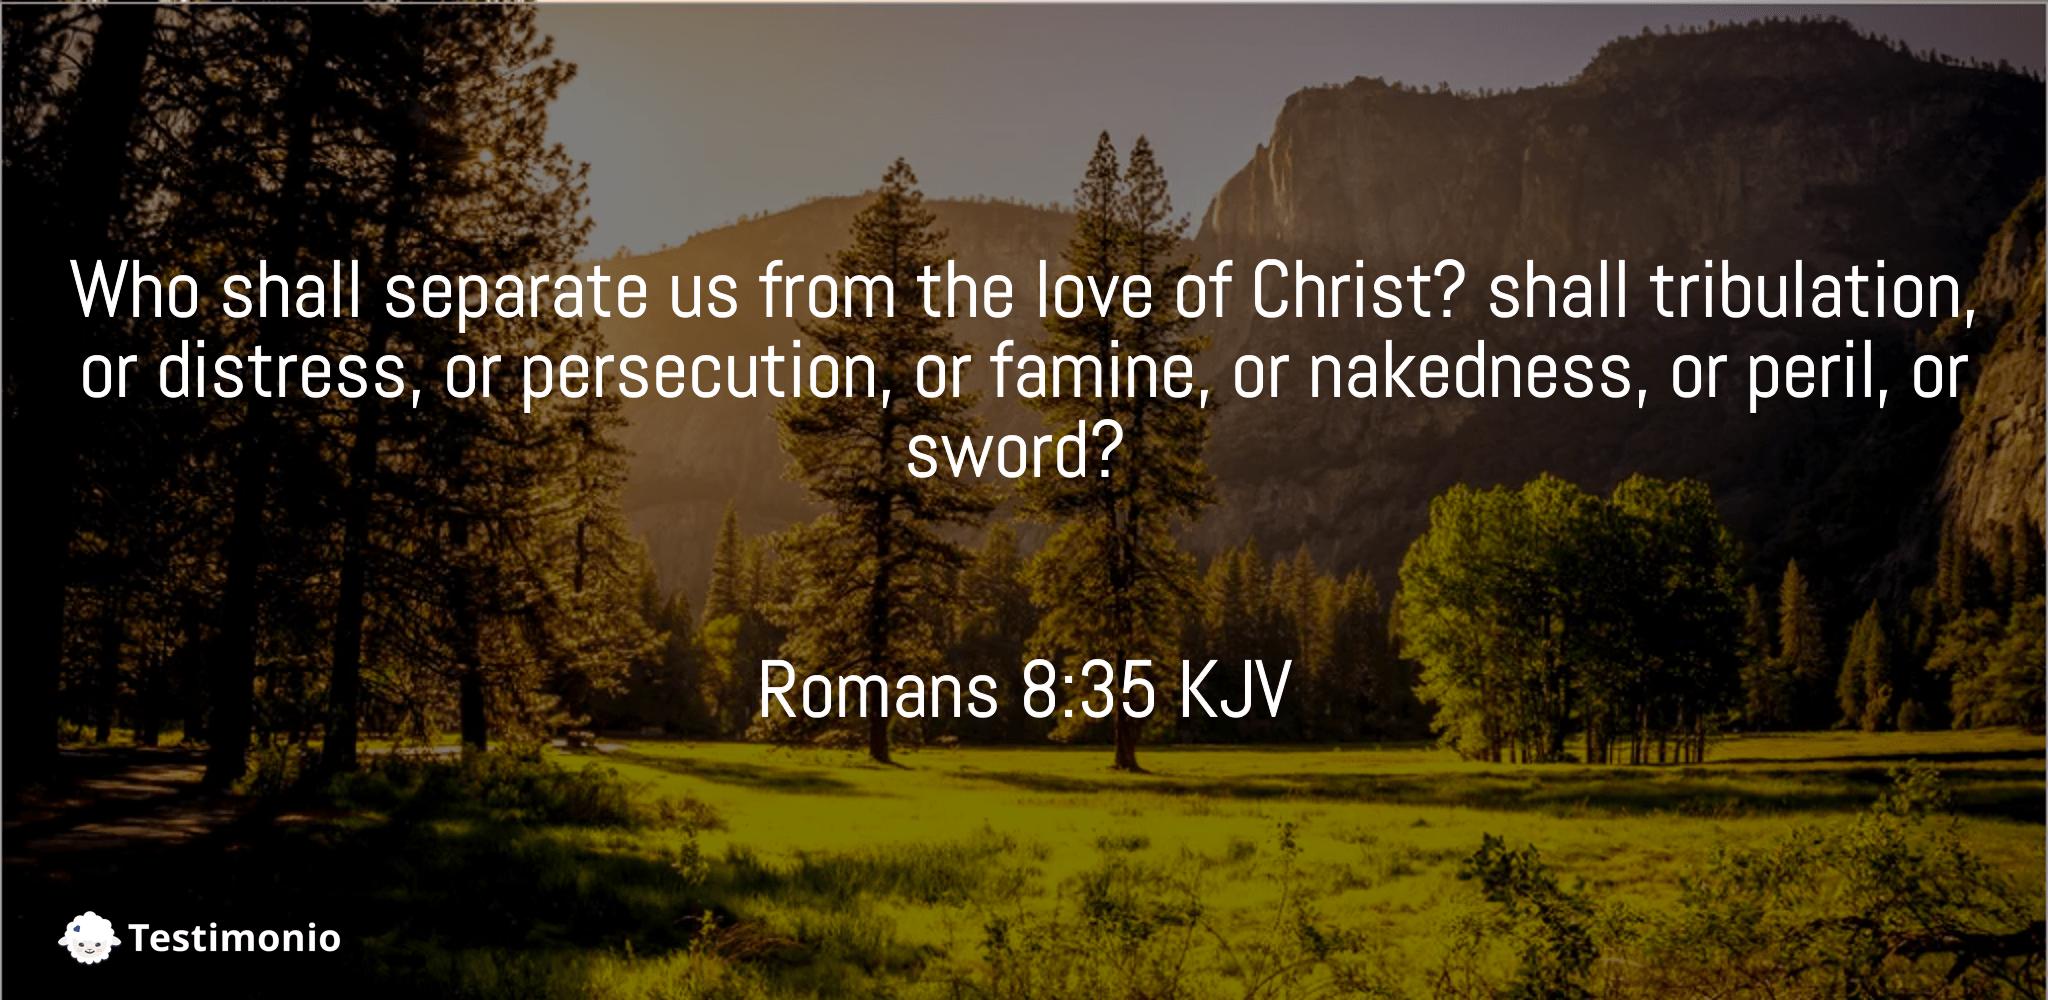 Romans 8:35